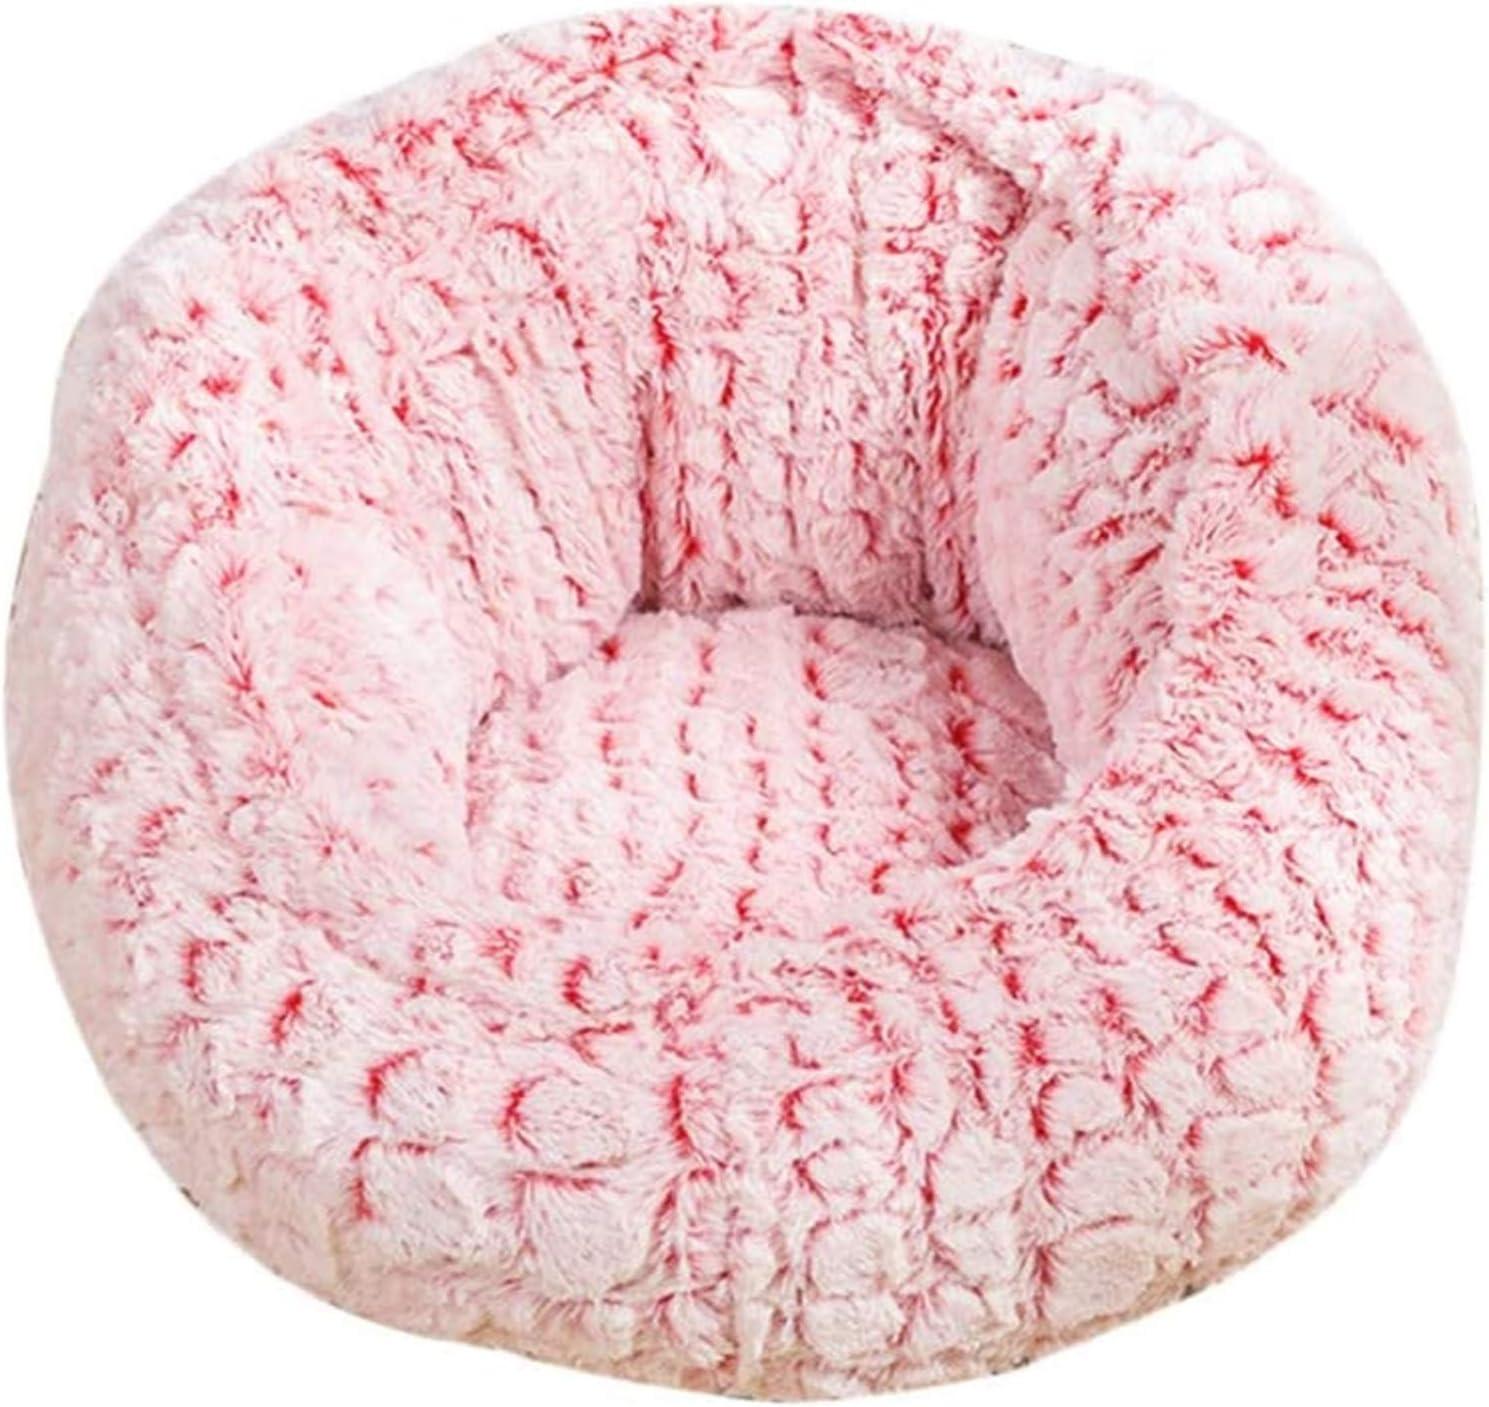 Getrichar Winter Pet Bed Thickened Soft Dog Drawstring Desig Overseas parallel import regular Albuquerque Mall item